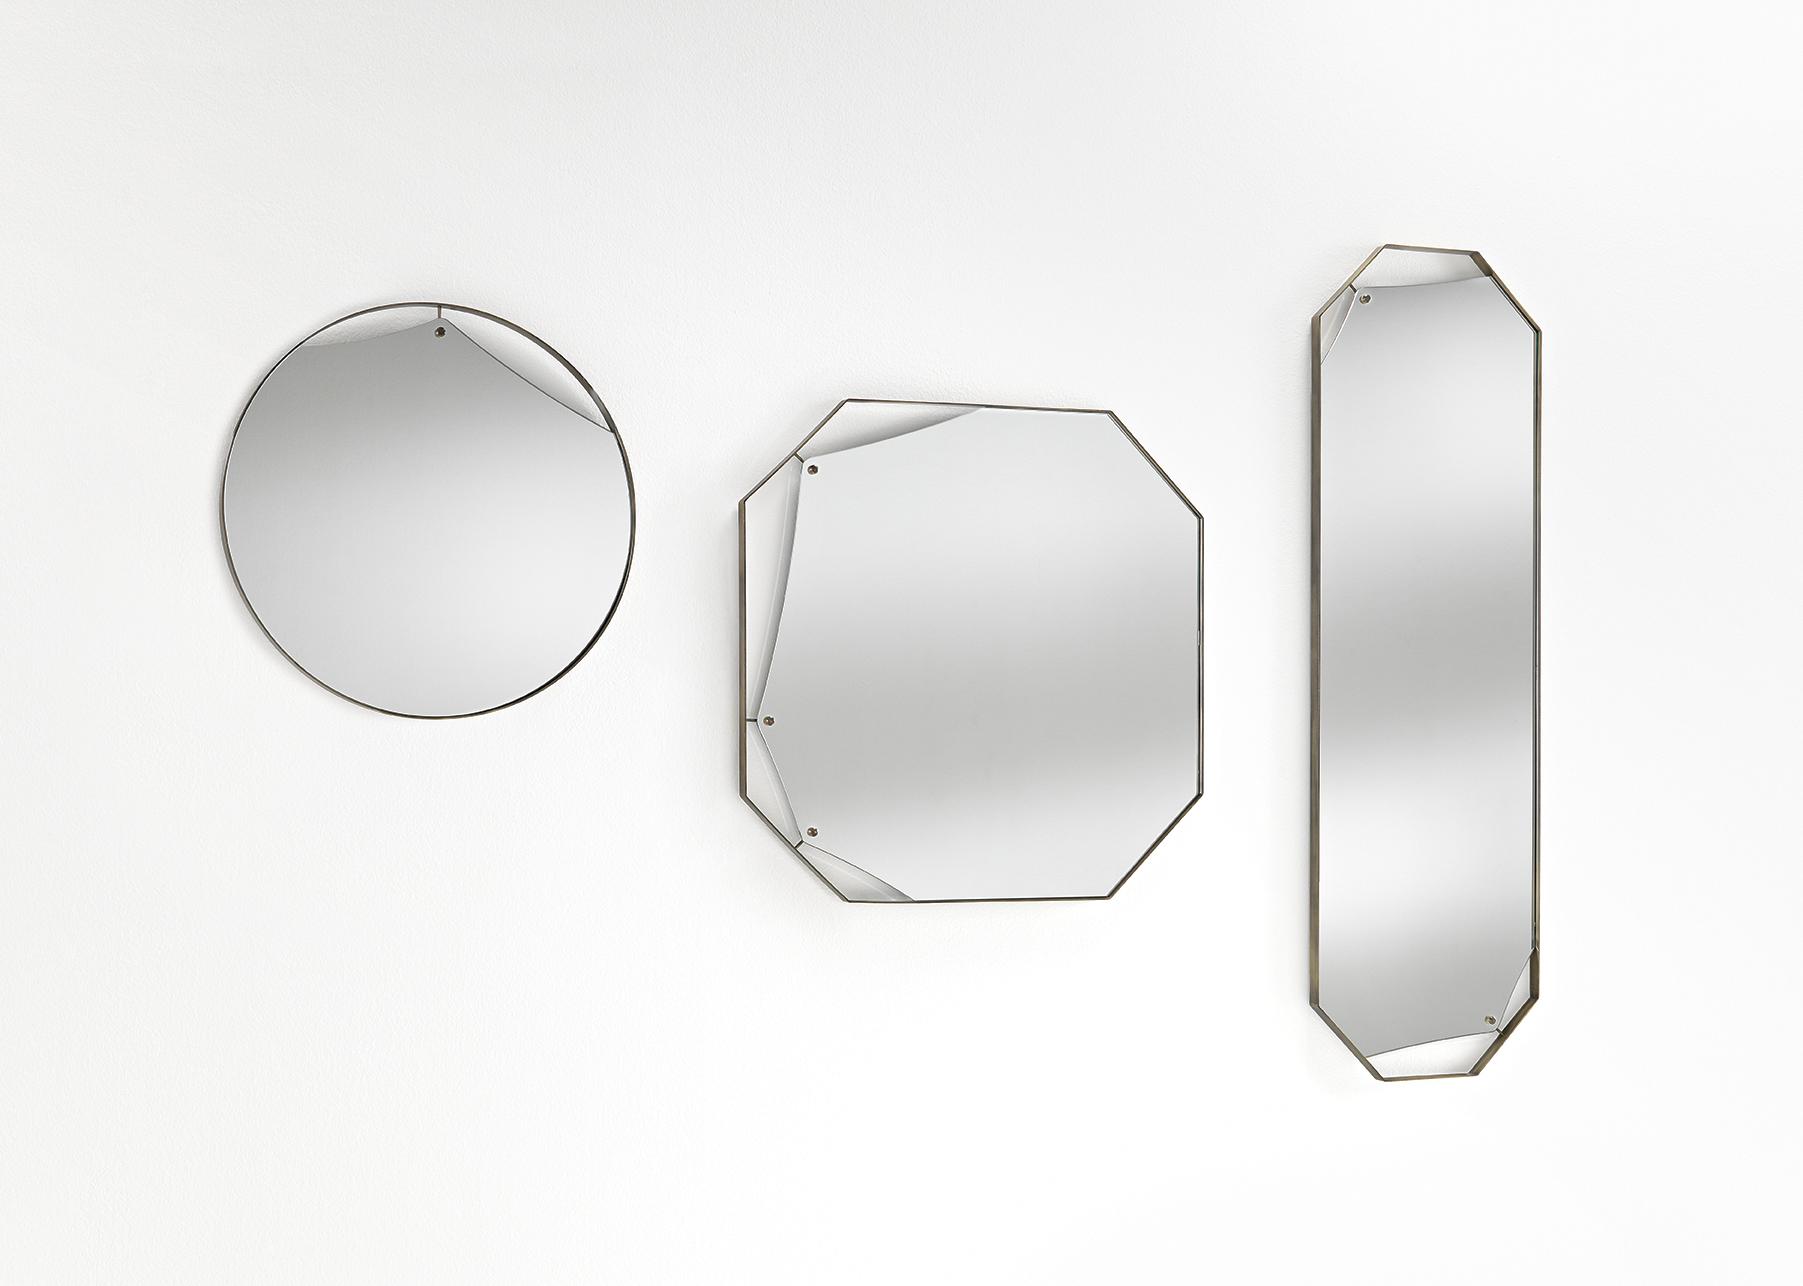 FIAM glazen design spiegel Pinch design by Lanzavecchia en Wai